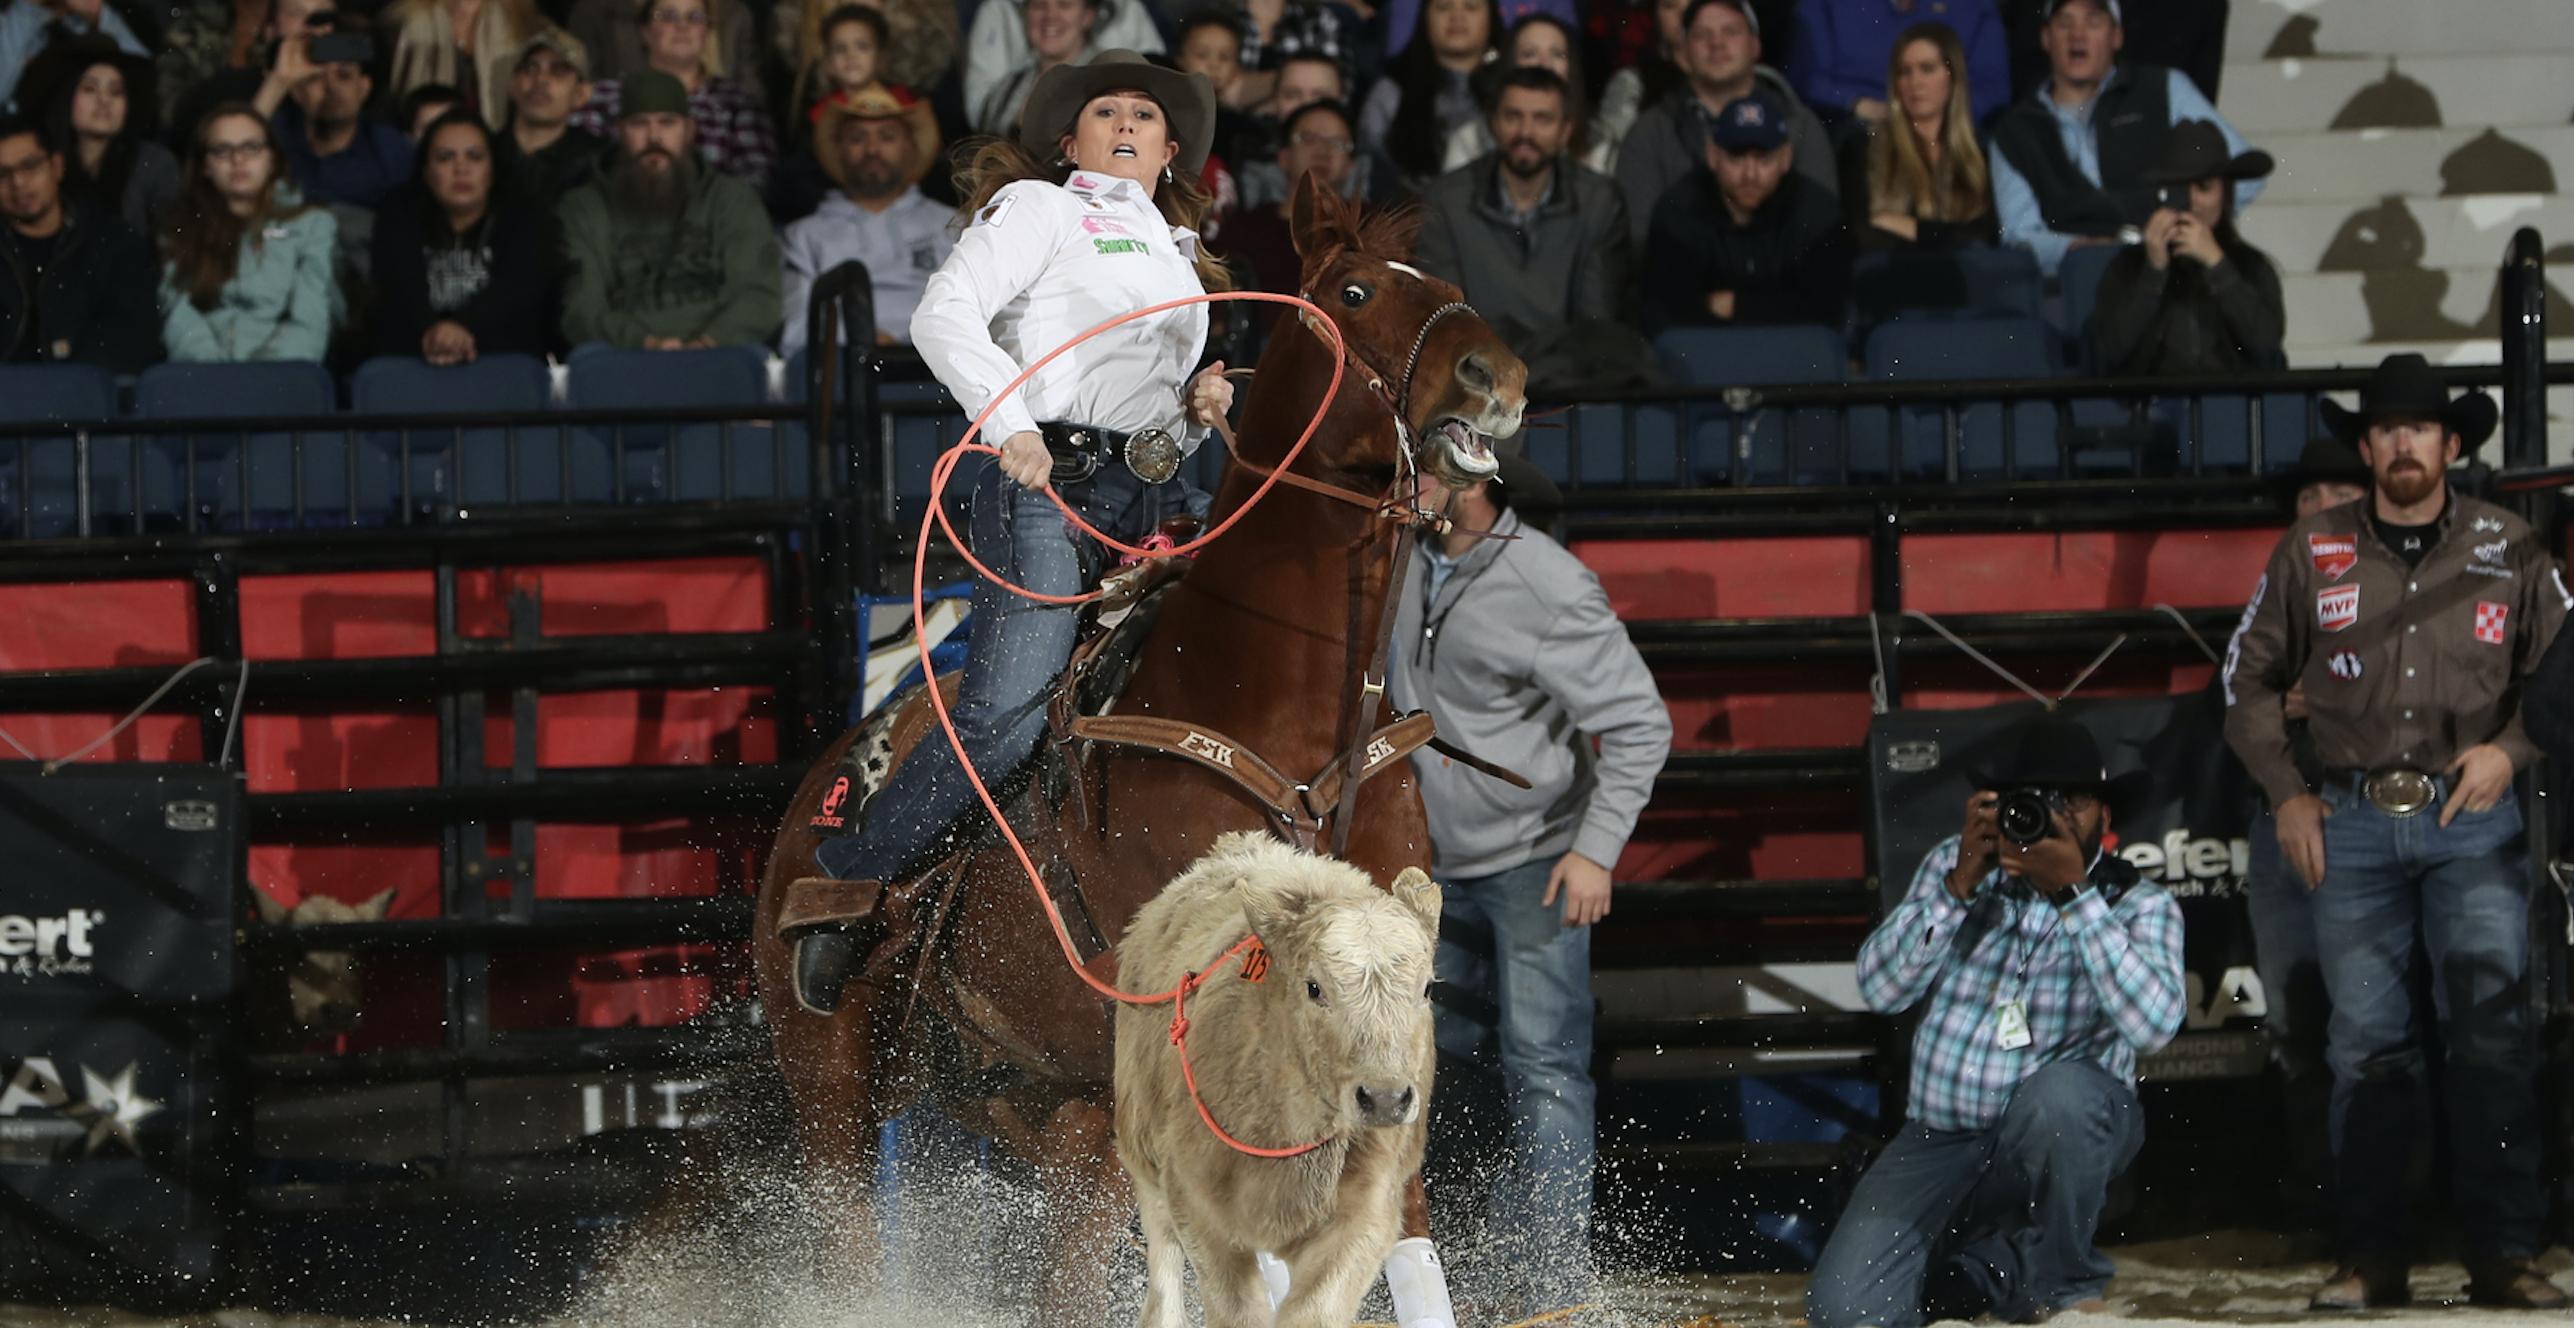 WCRA Breakaway Roping Womans Rodeo Championship